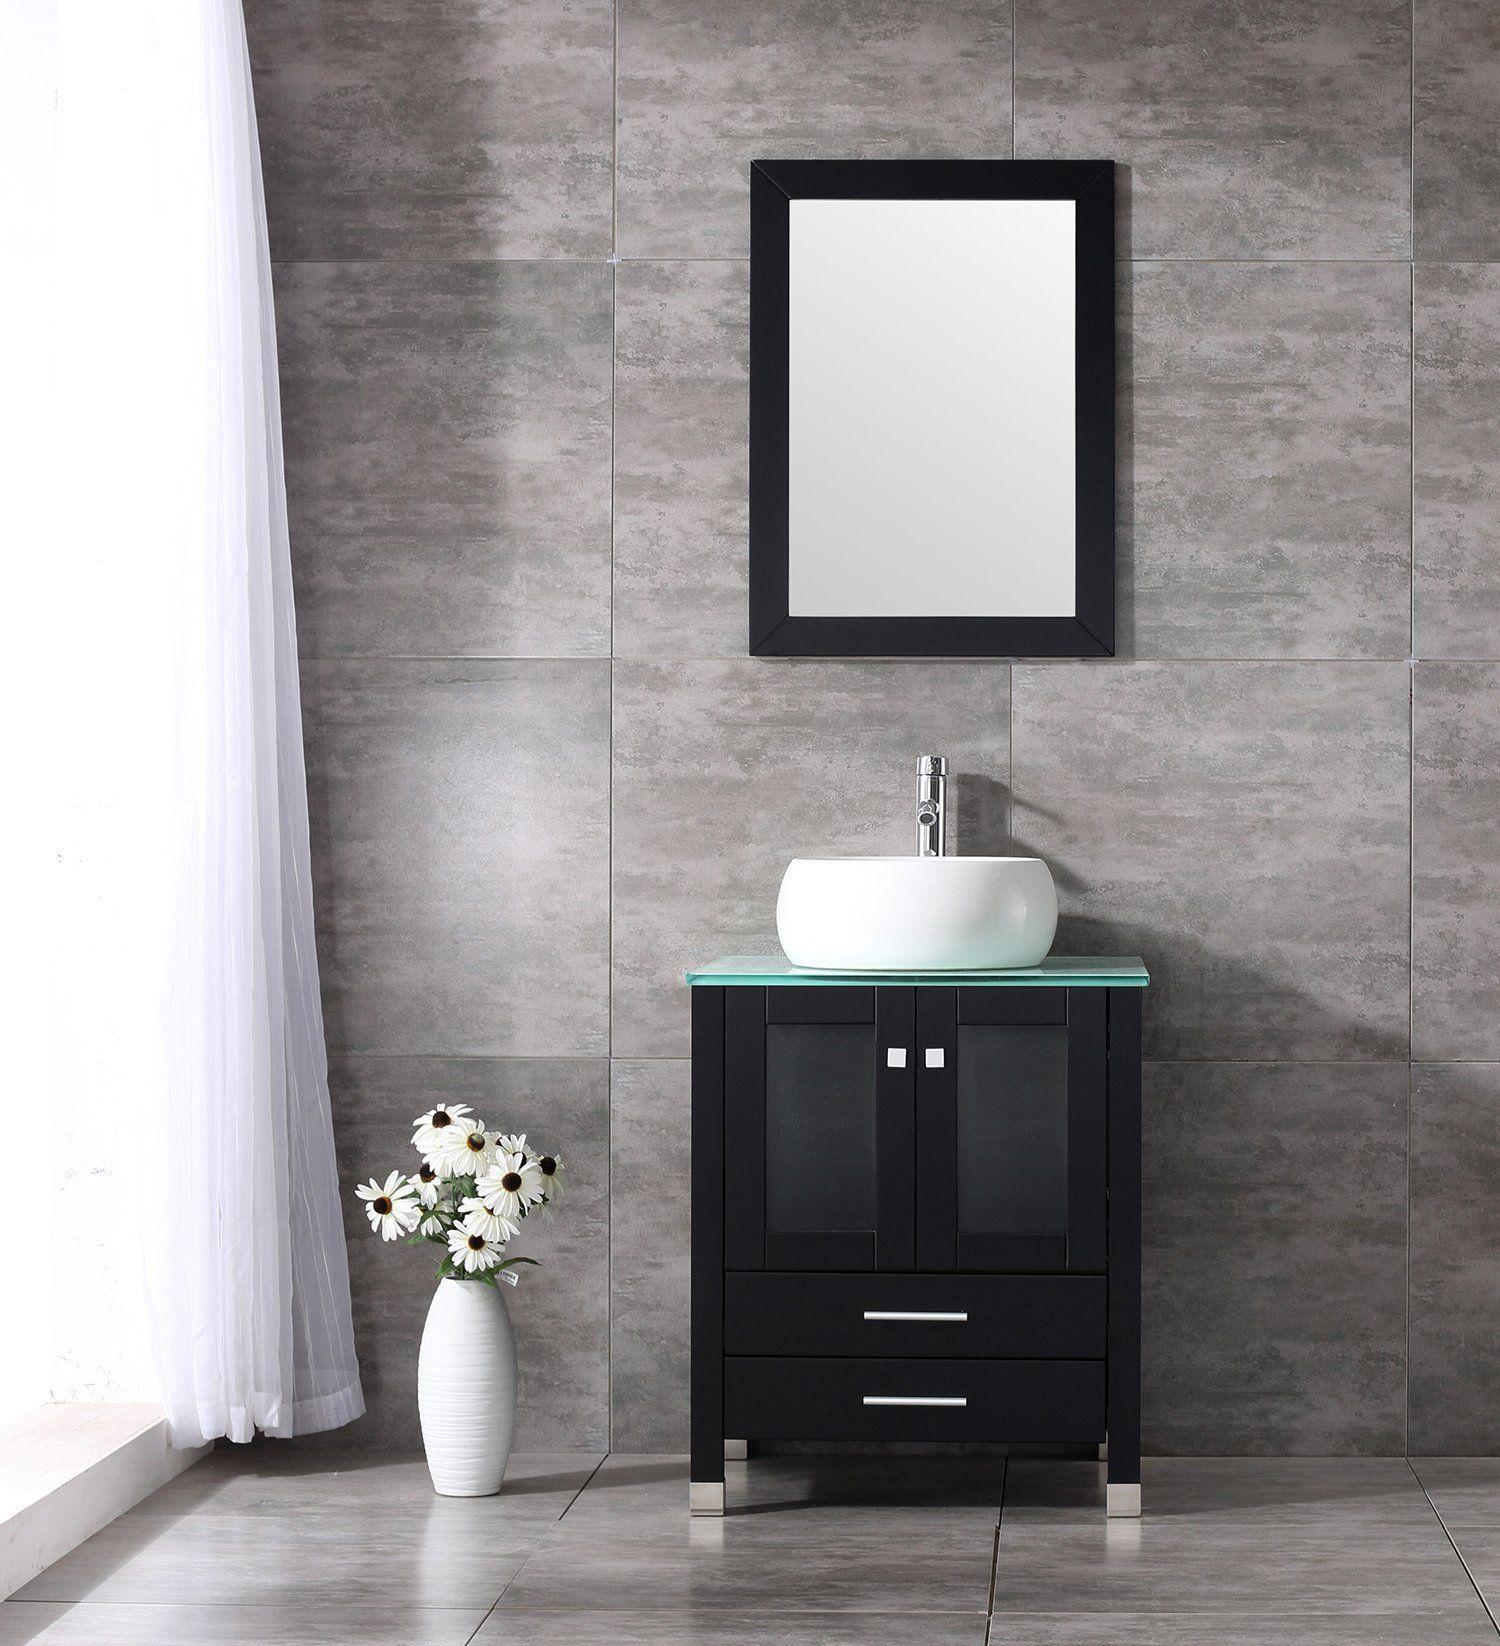 Walcut inch wood bathroom vanity mirror cylinder vessel sink